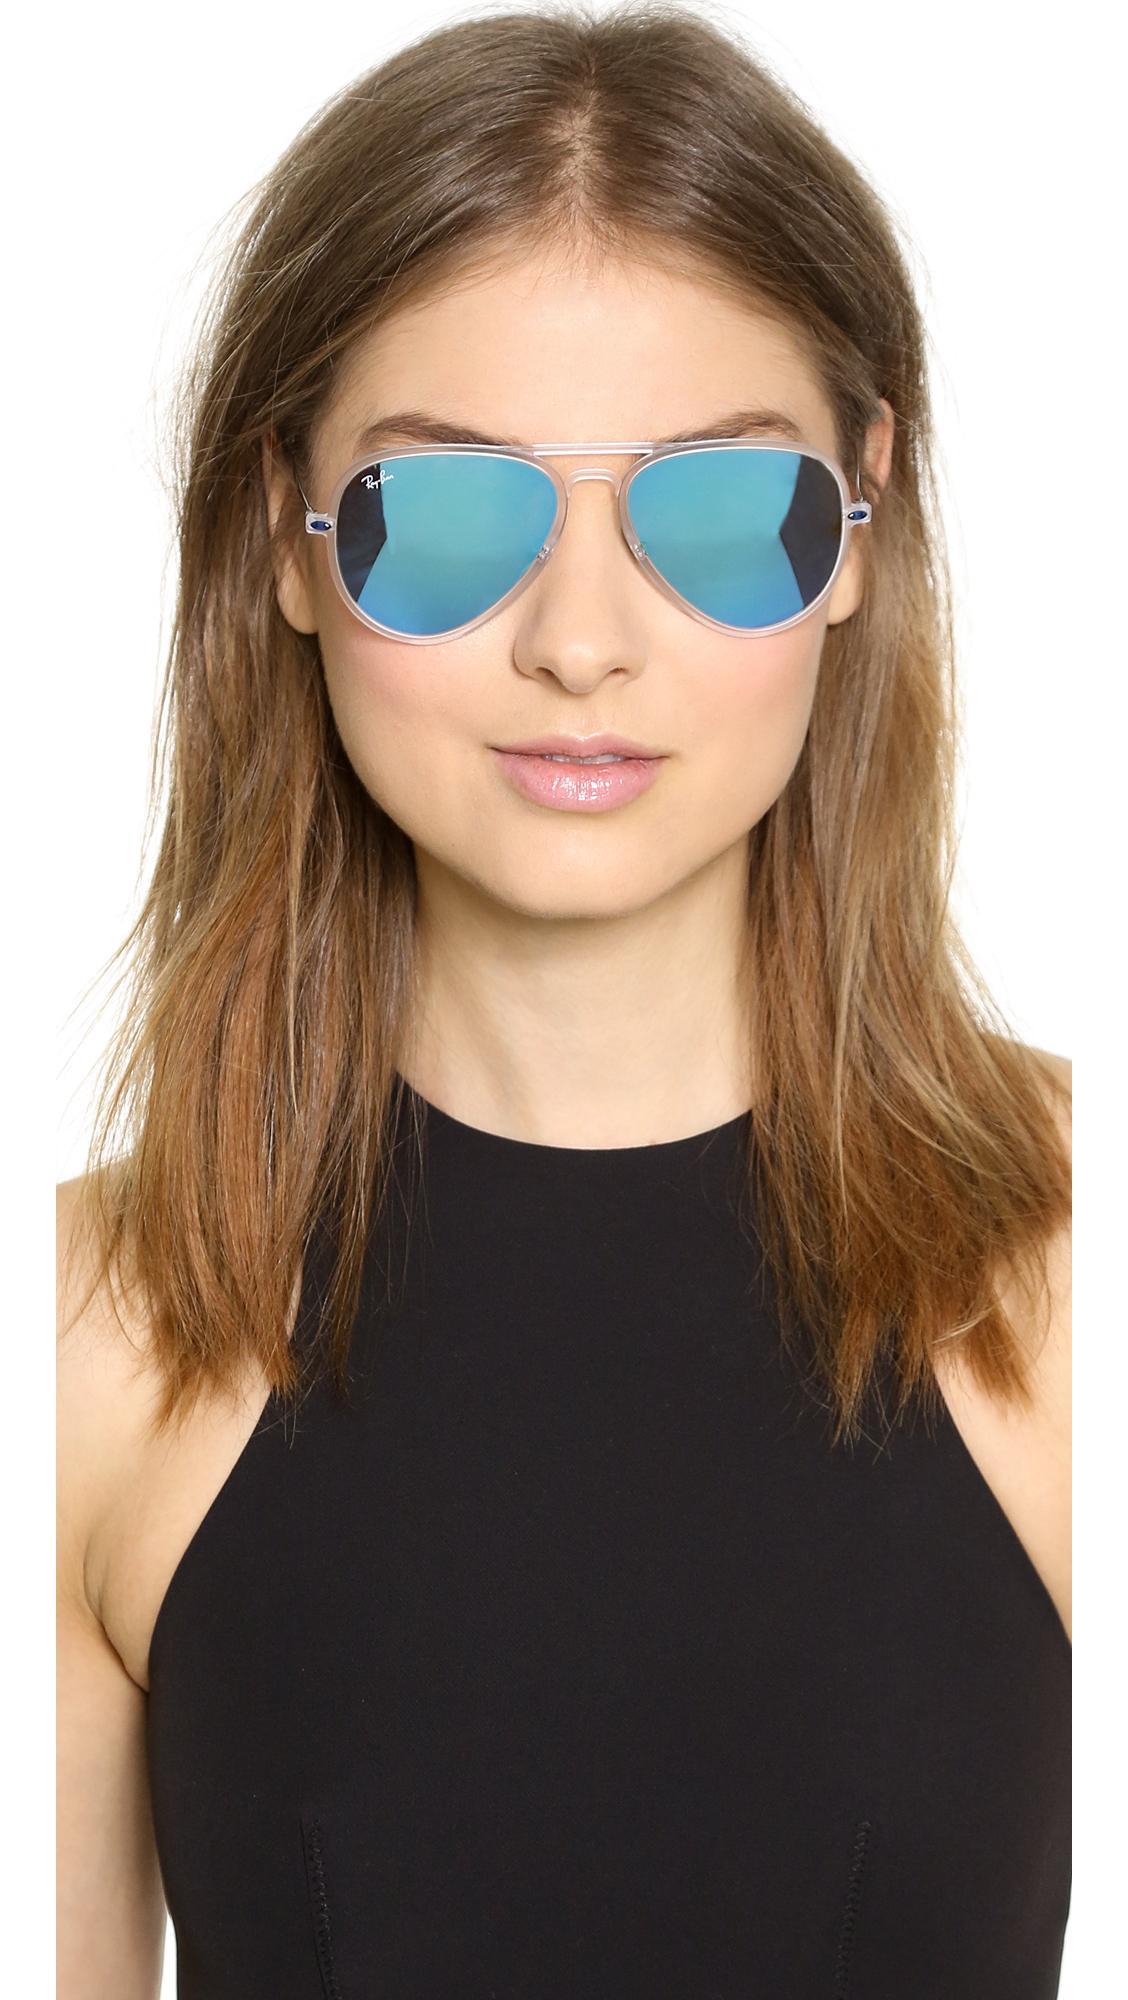 ... ii sunglasses rb 4211 612213 new 07b7a 0dad3 cheapest lyst ray ban tech  light aviator sunglasses matte transparentblue 95e49 f1ea0 ... b8b38ec05c